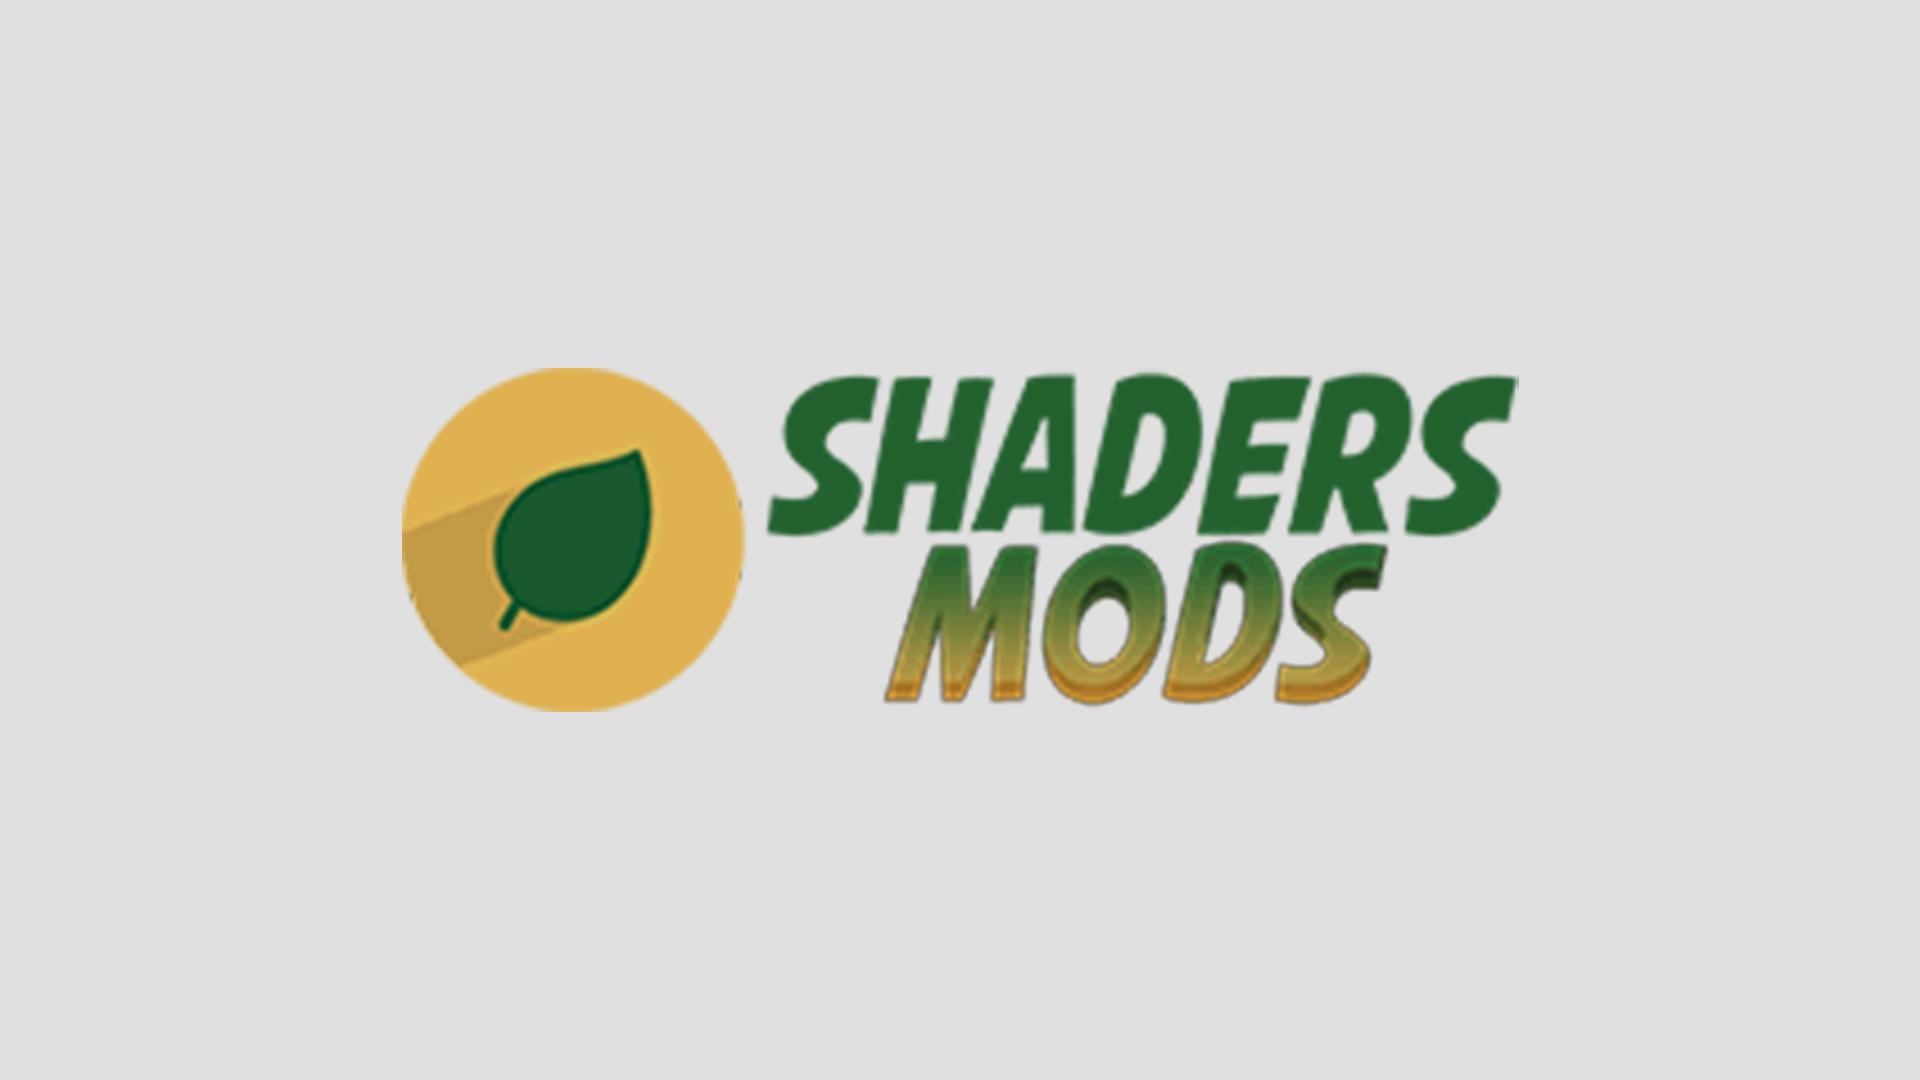 shaders-mods-logo